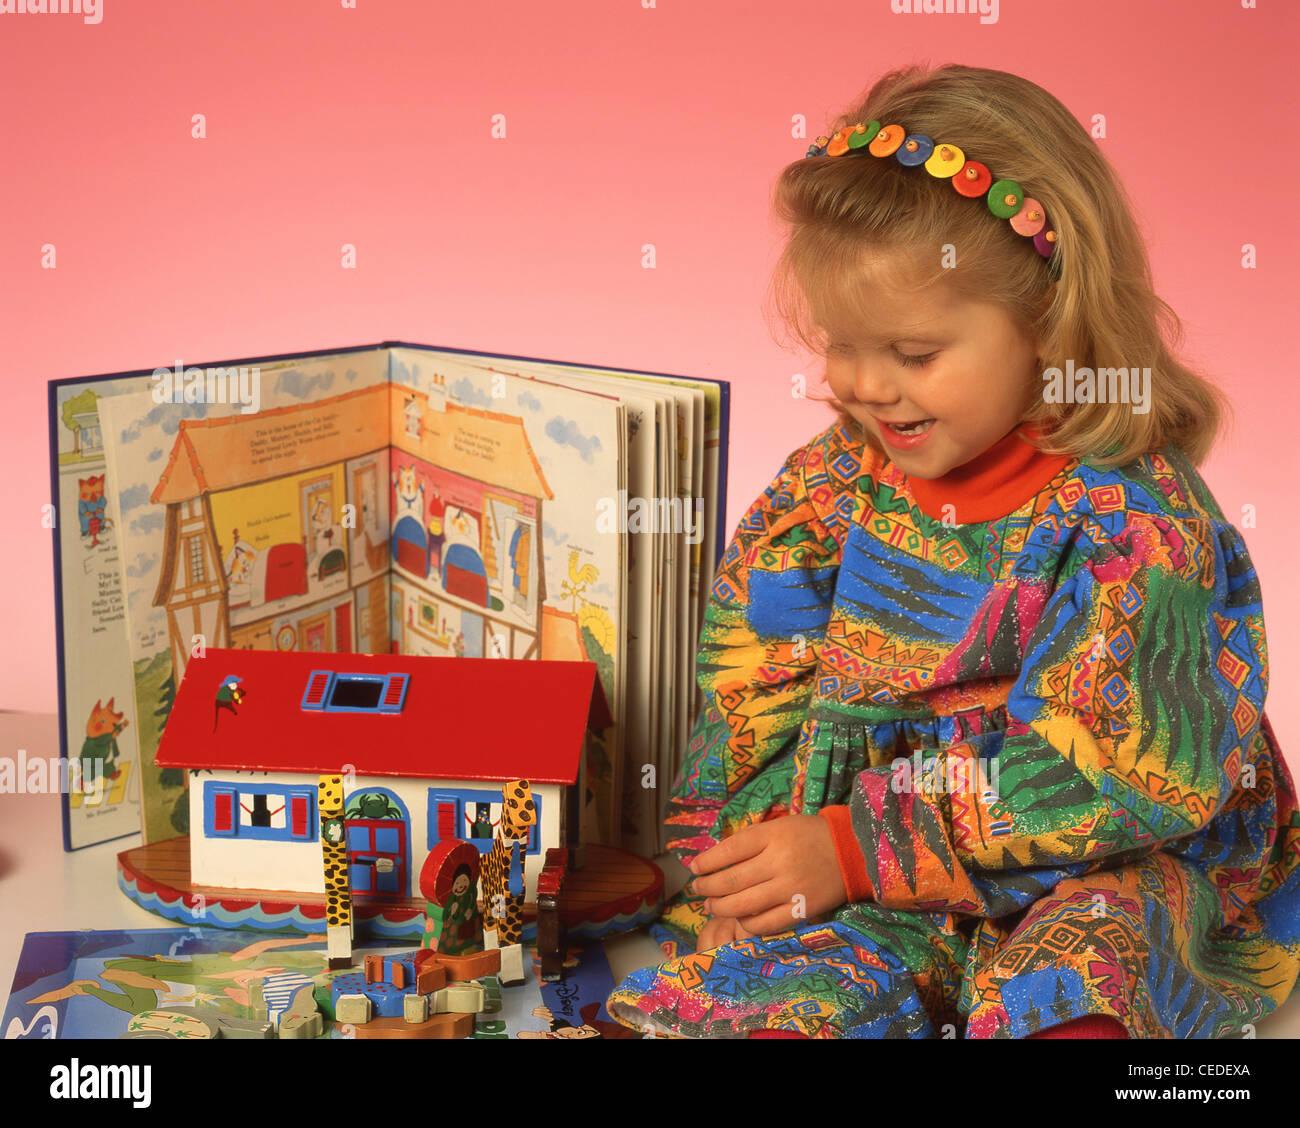 Jeune fille jouant avec des jouets, Berkshire, Angleterre, Royaume-Uni Photo Stock